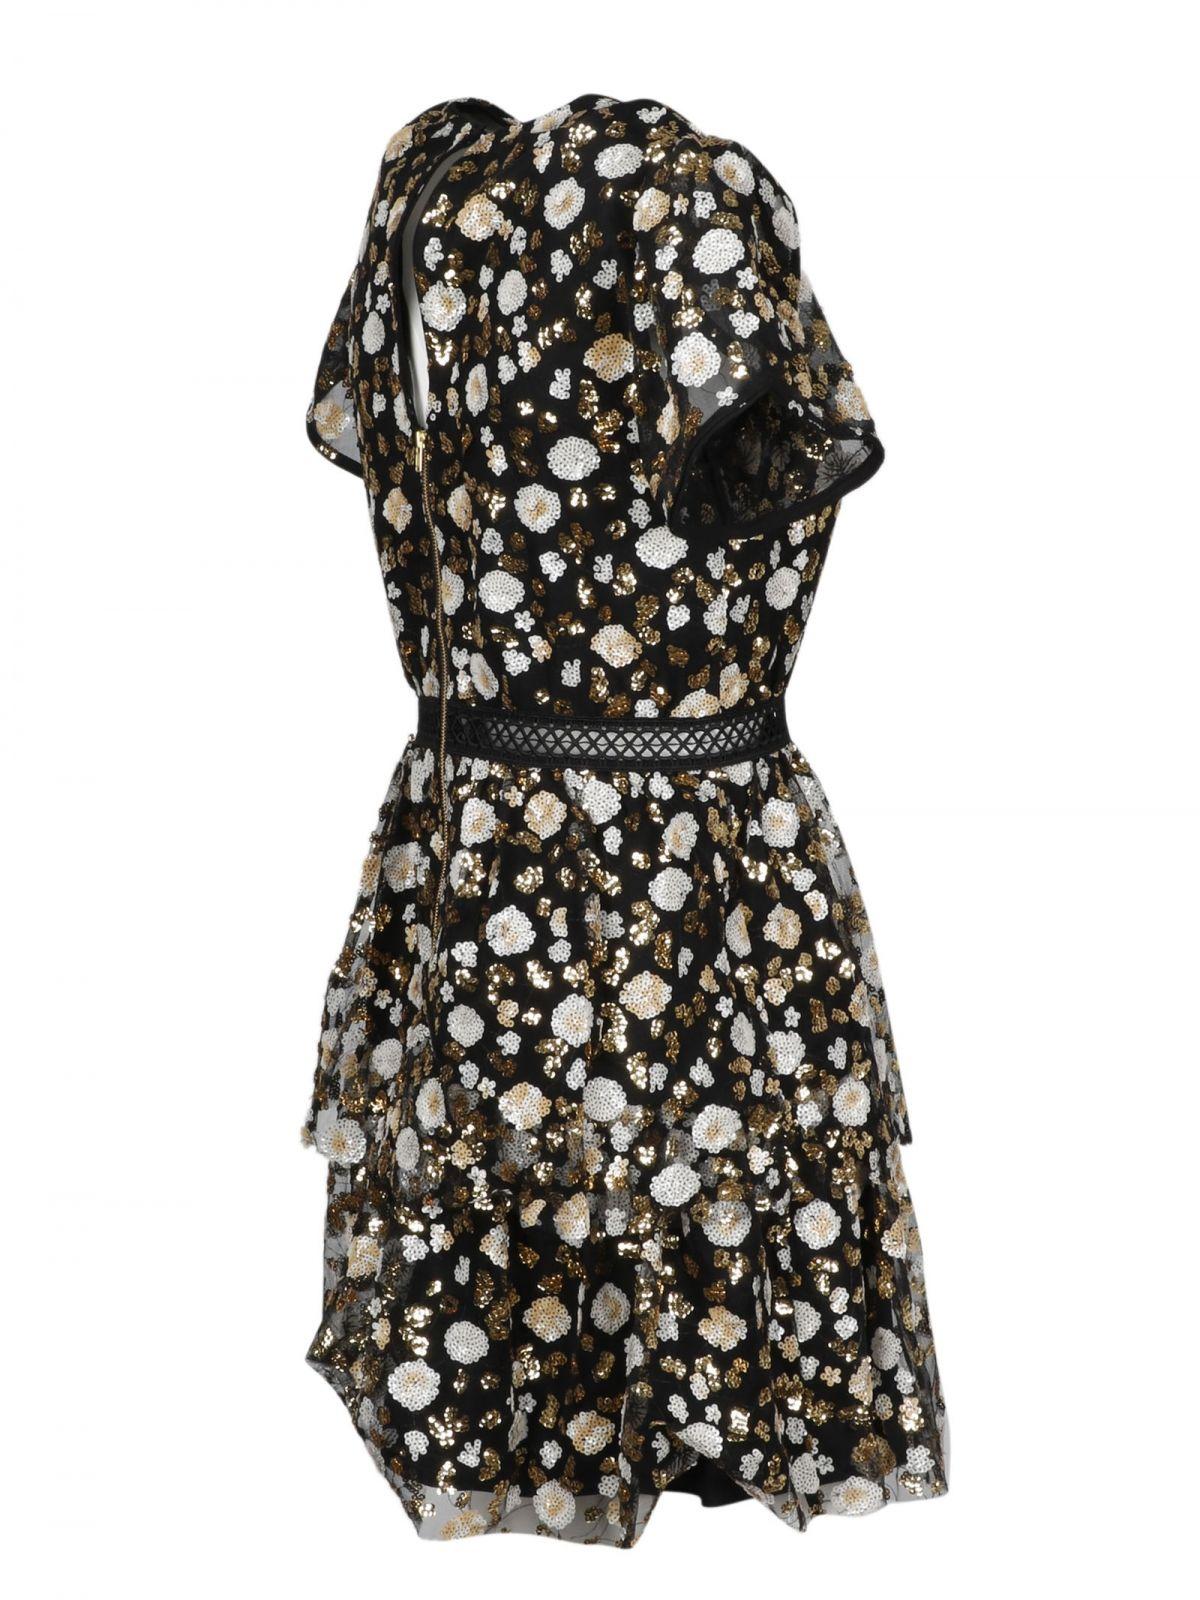 SELF-PORTRAIT Dresses SELF-PORTRAIT WOMEN'S BLACK POLYESTER DRESS